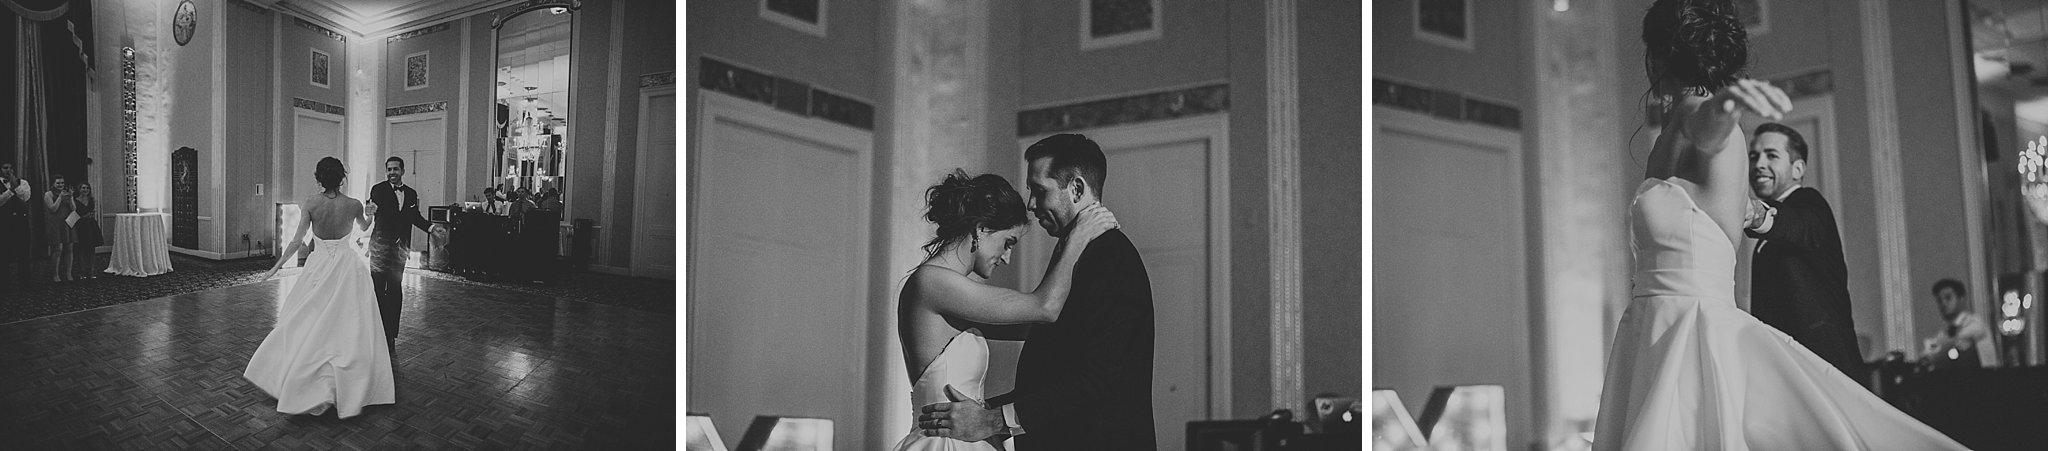 Matt-Lauren_St-Marys_Hilton-City-Center-Milwaukee-Wedding_liller-photo_0088.jpg